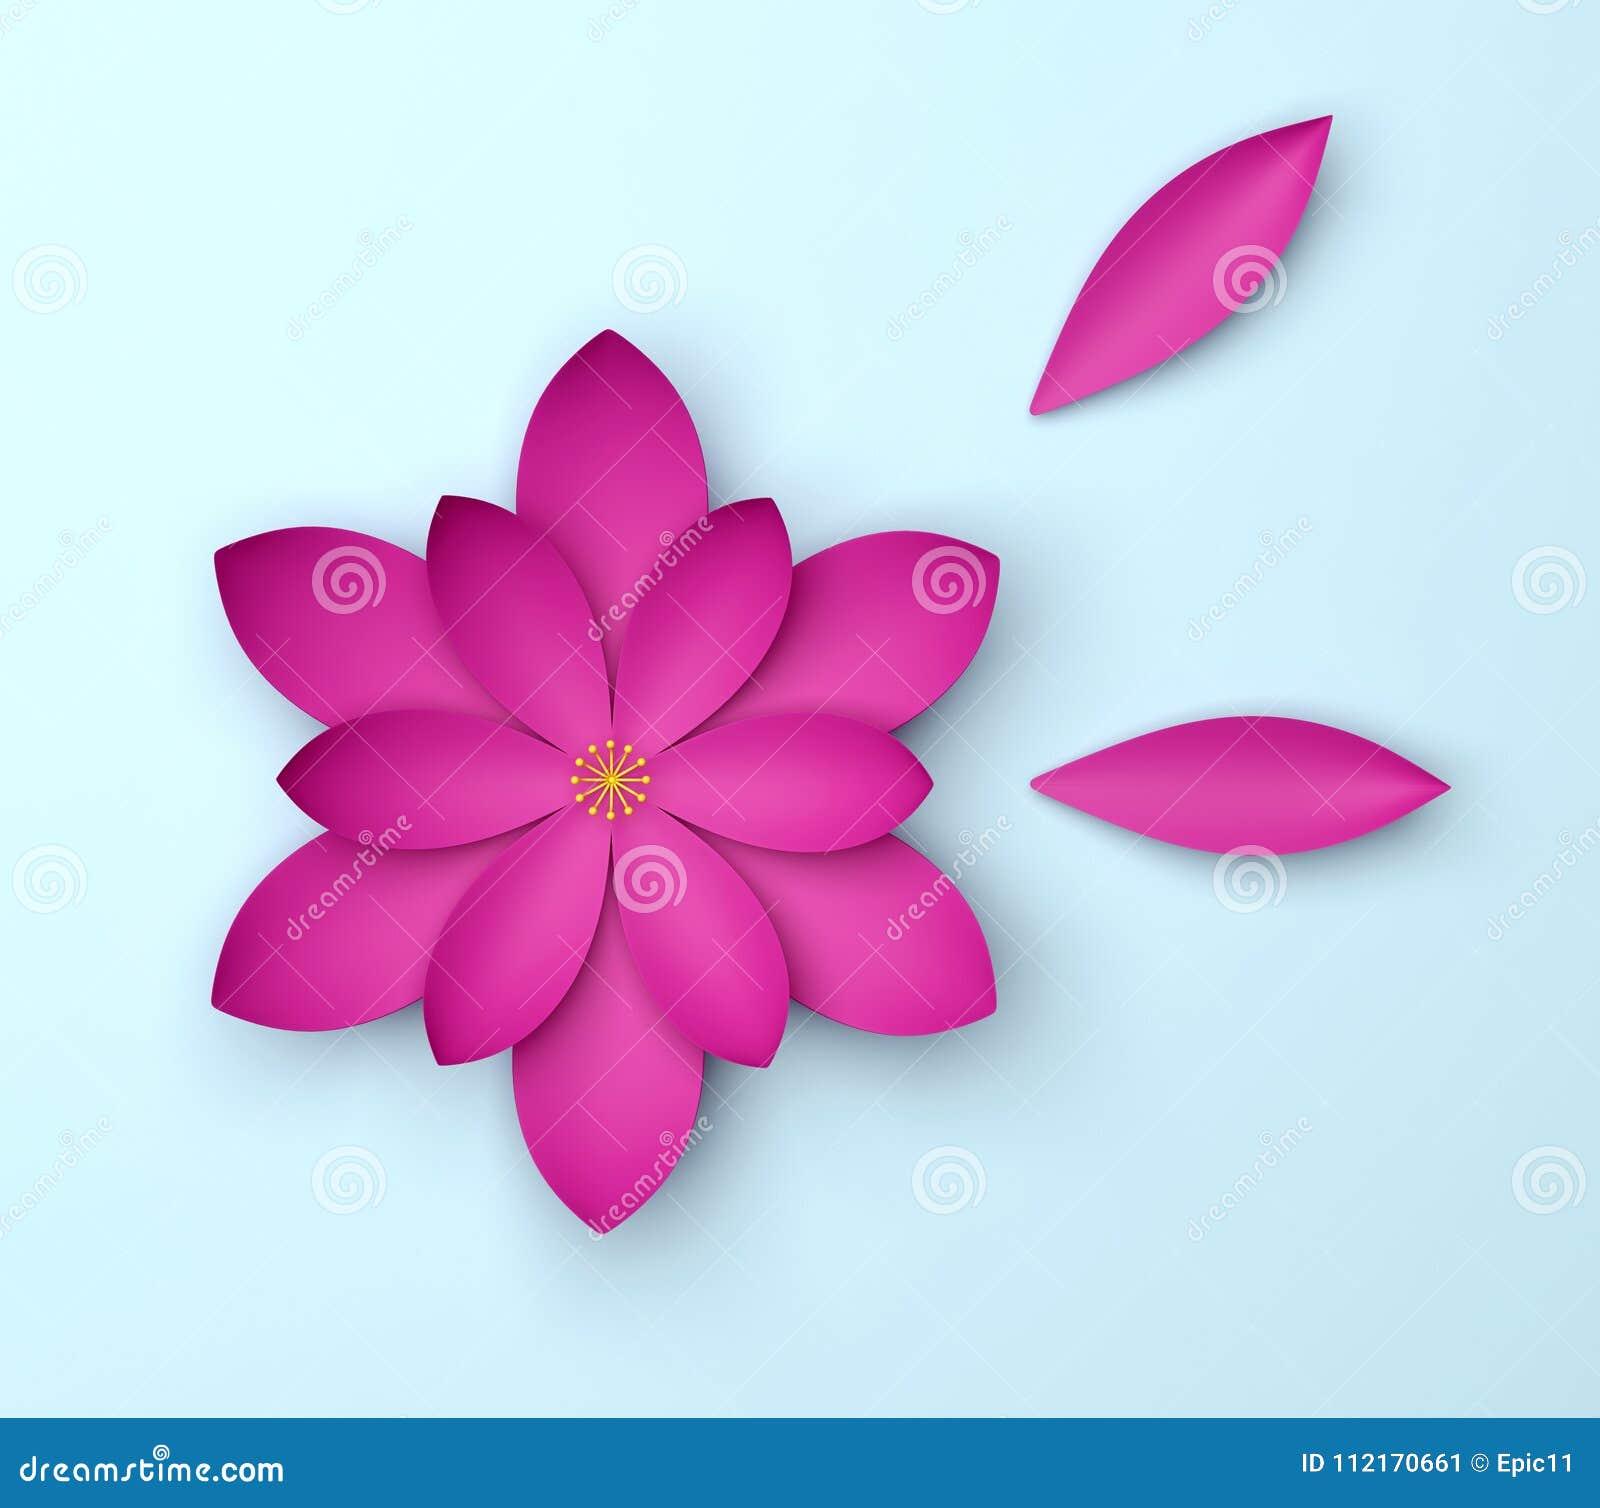 Single color decorative flower on blue background paper origami single color decorative flower on blue background paper origami lily izmirmasajfo